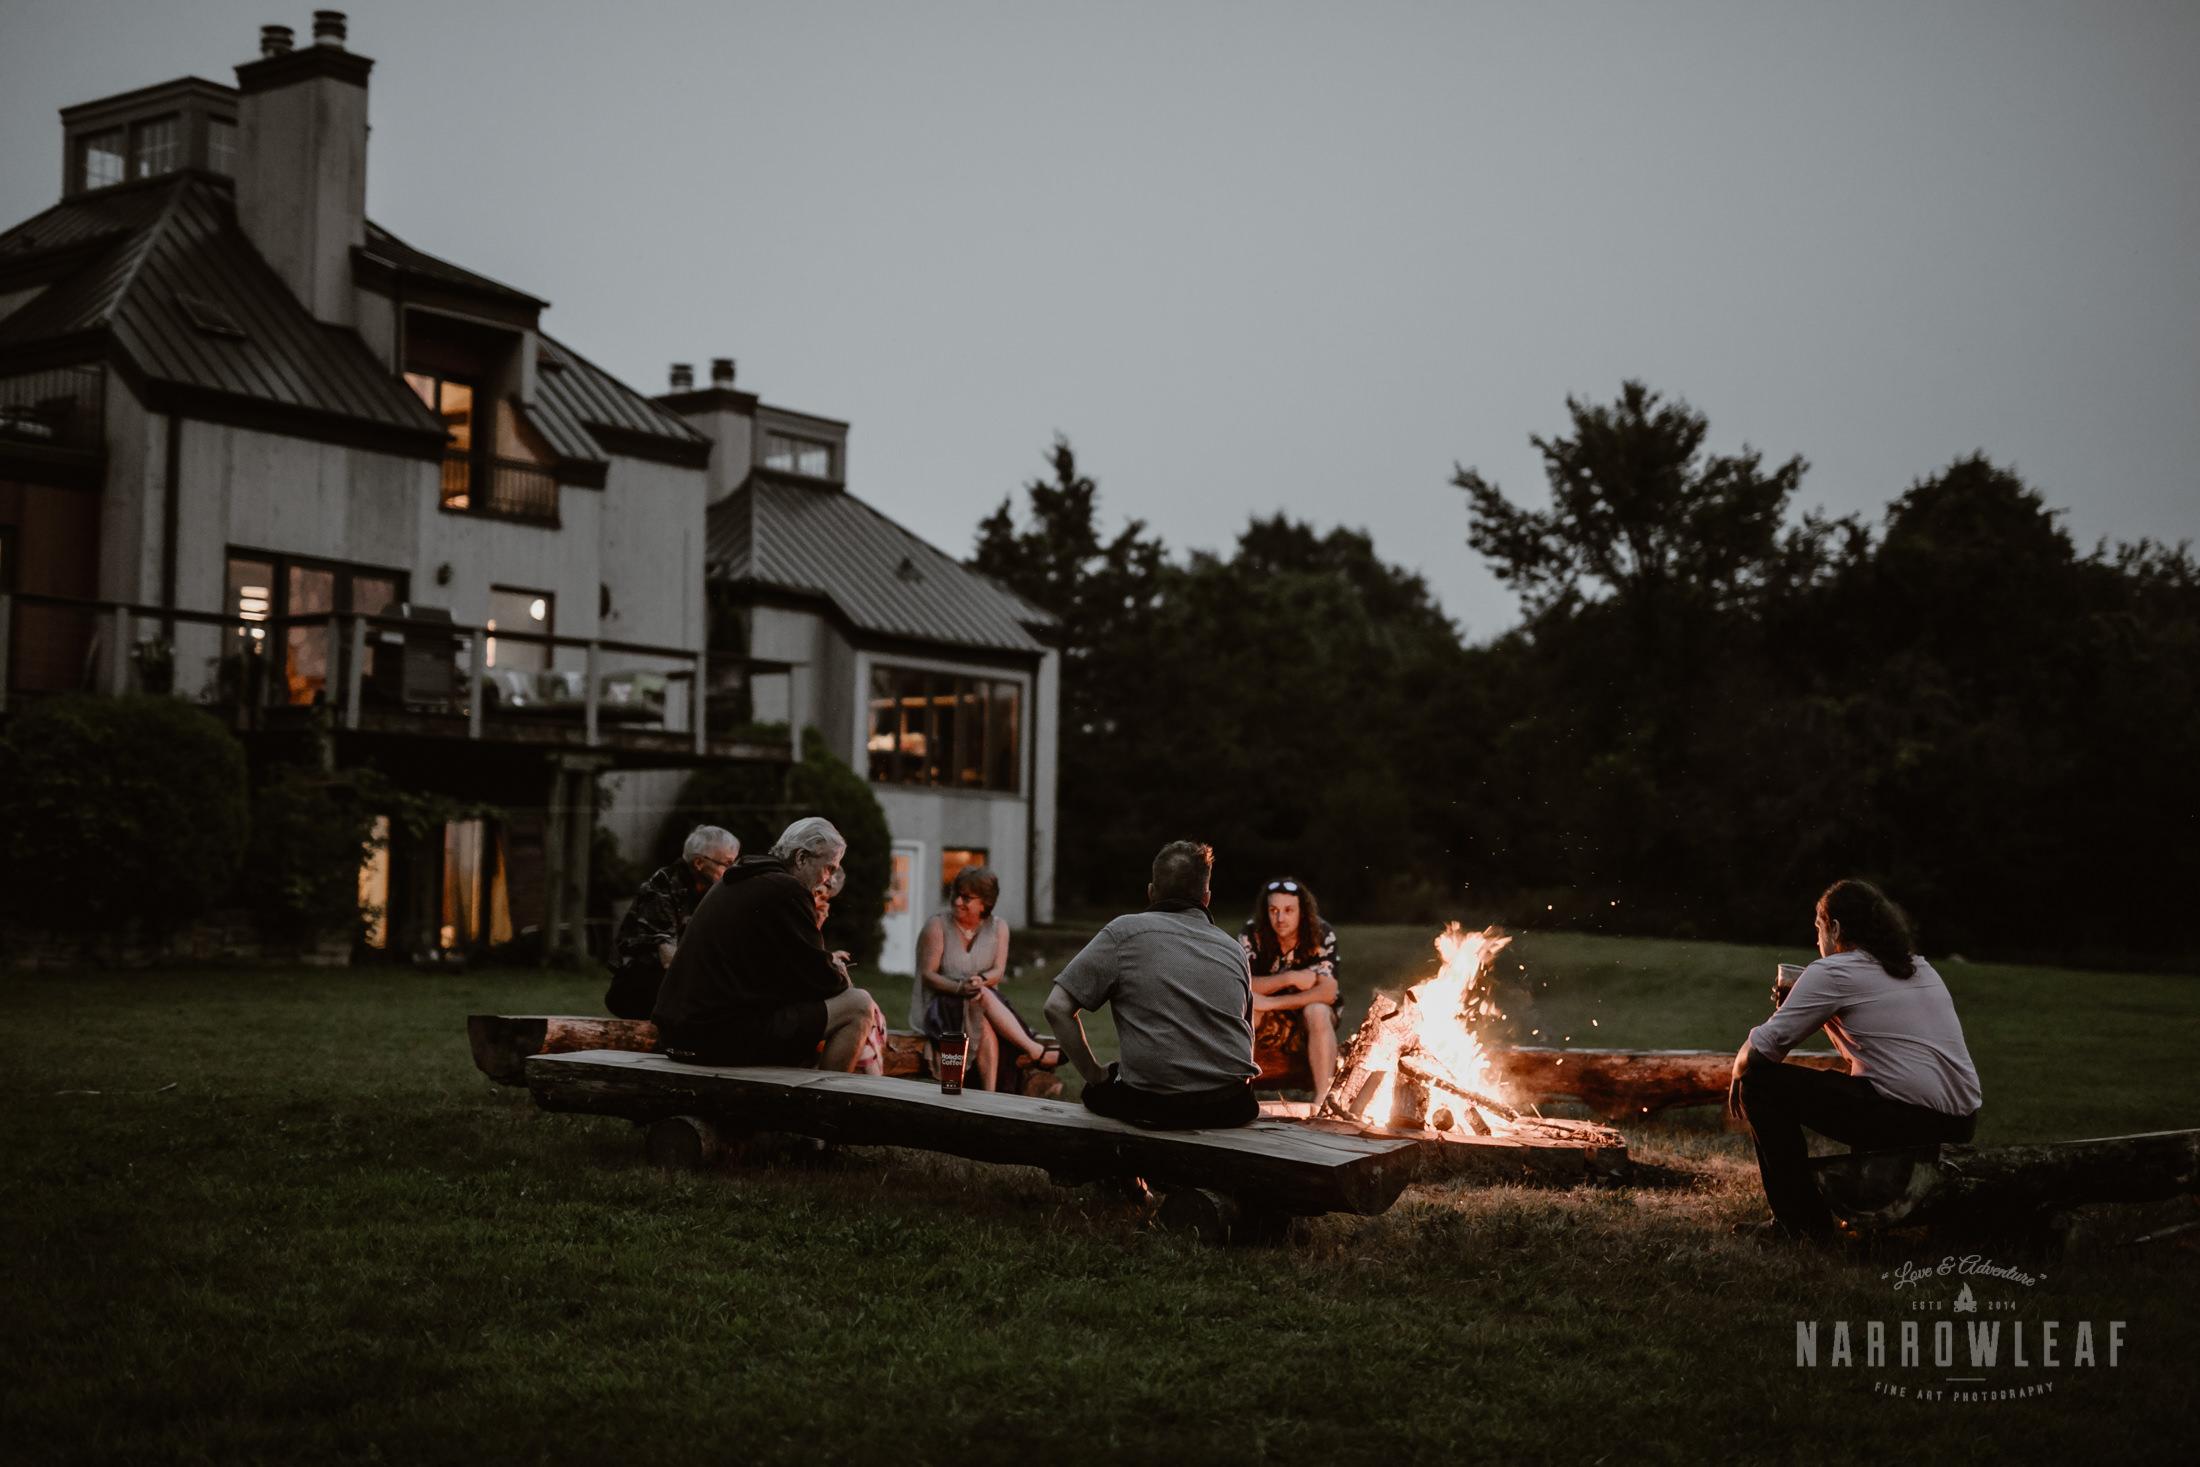 wisconsin-wedding-photographer-Narrowleaf_Love_and_Adventure_Photography-4130.jpg